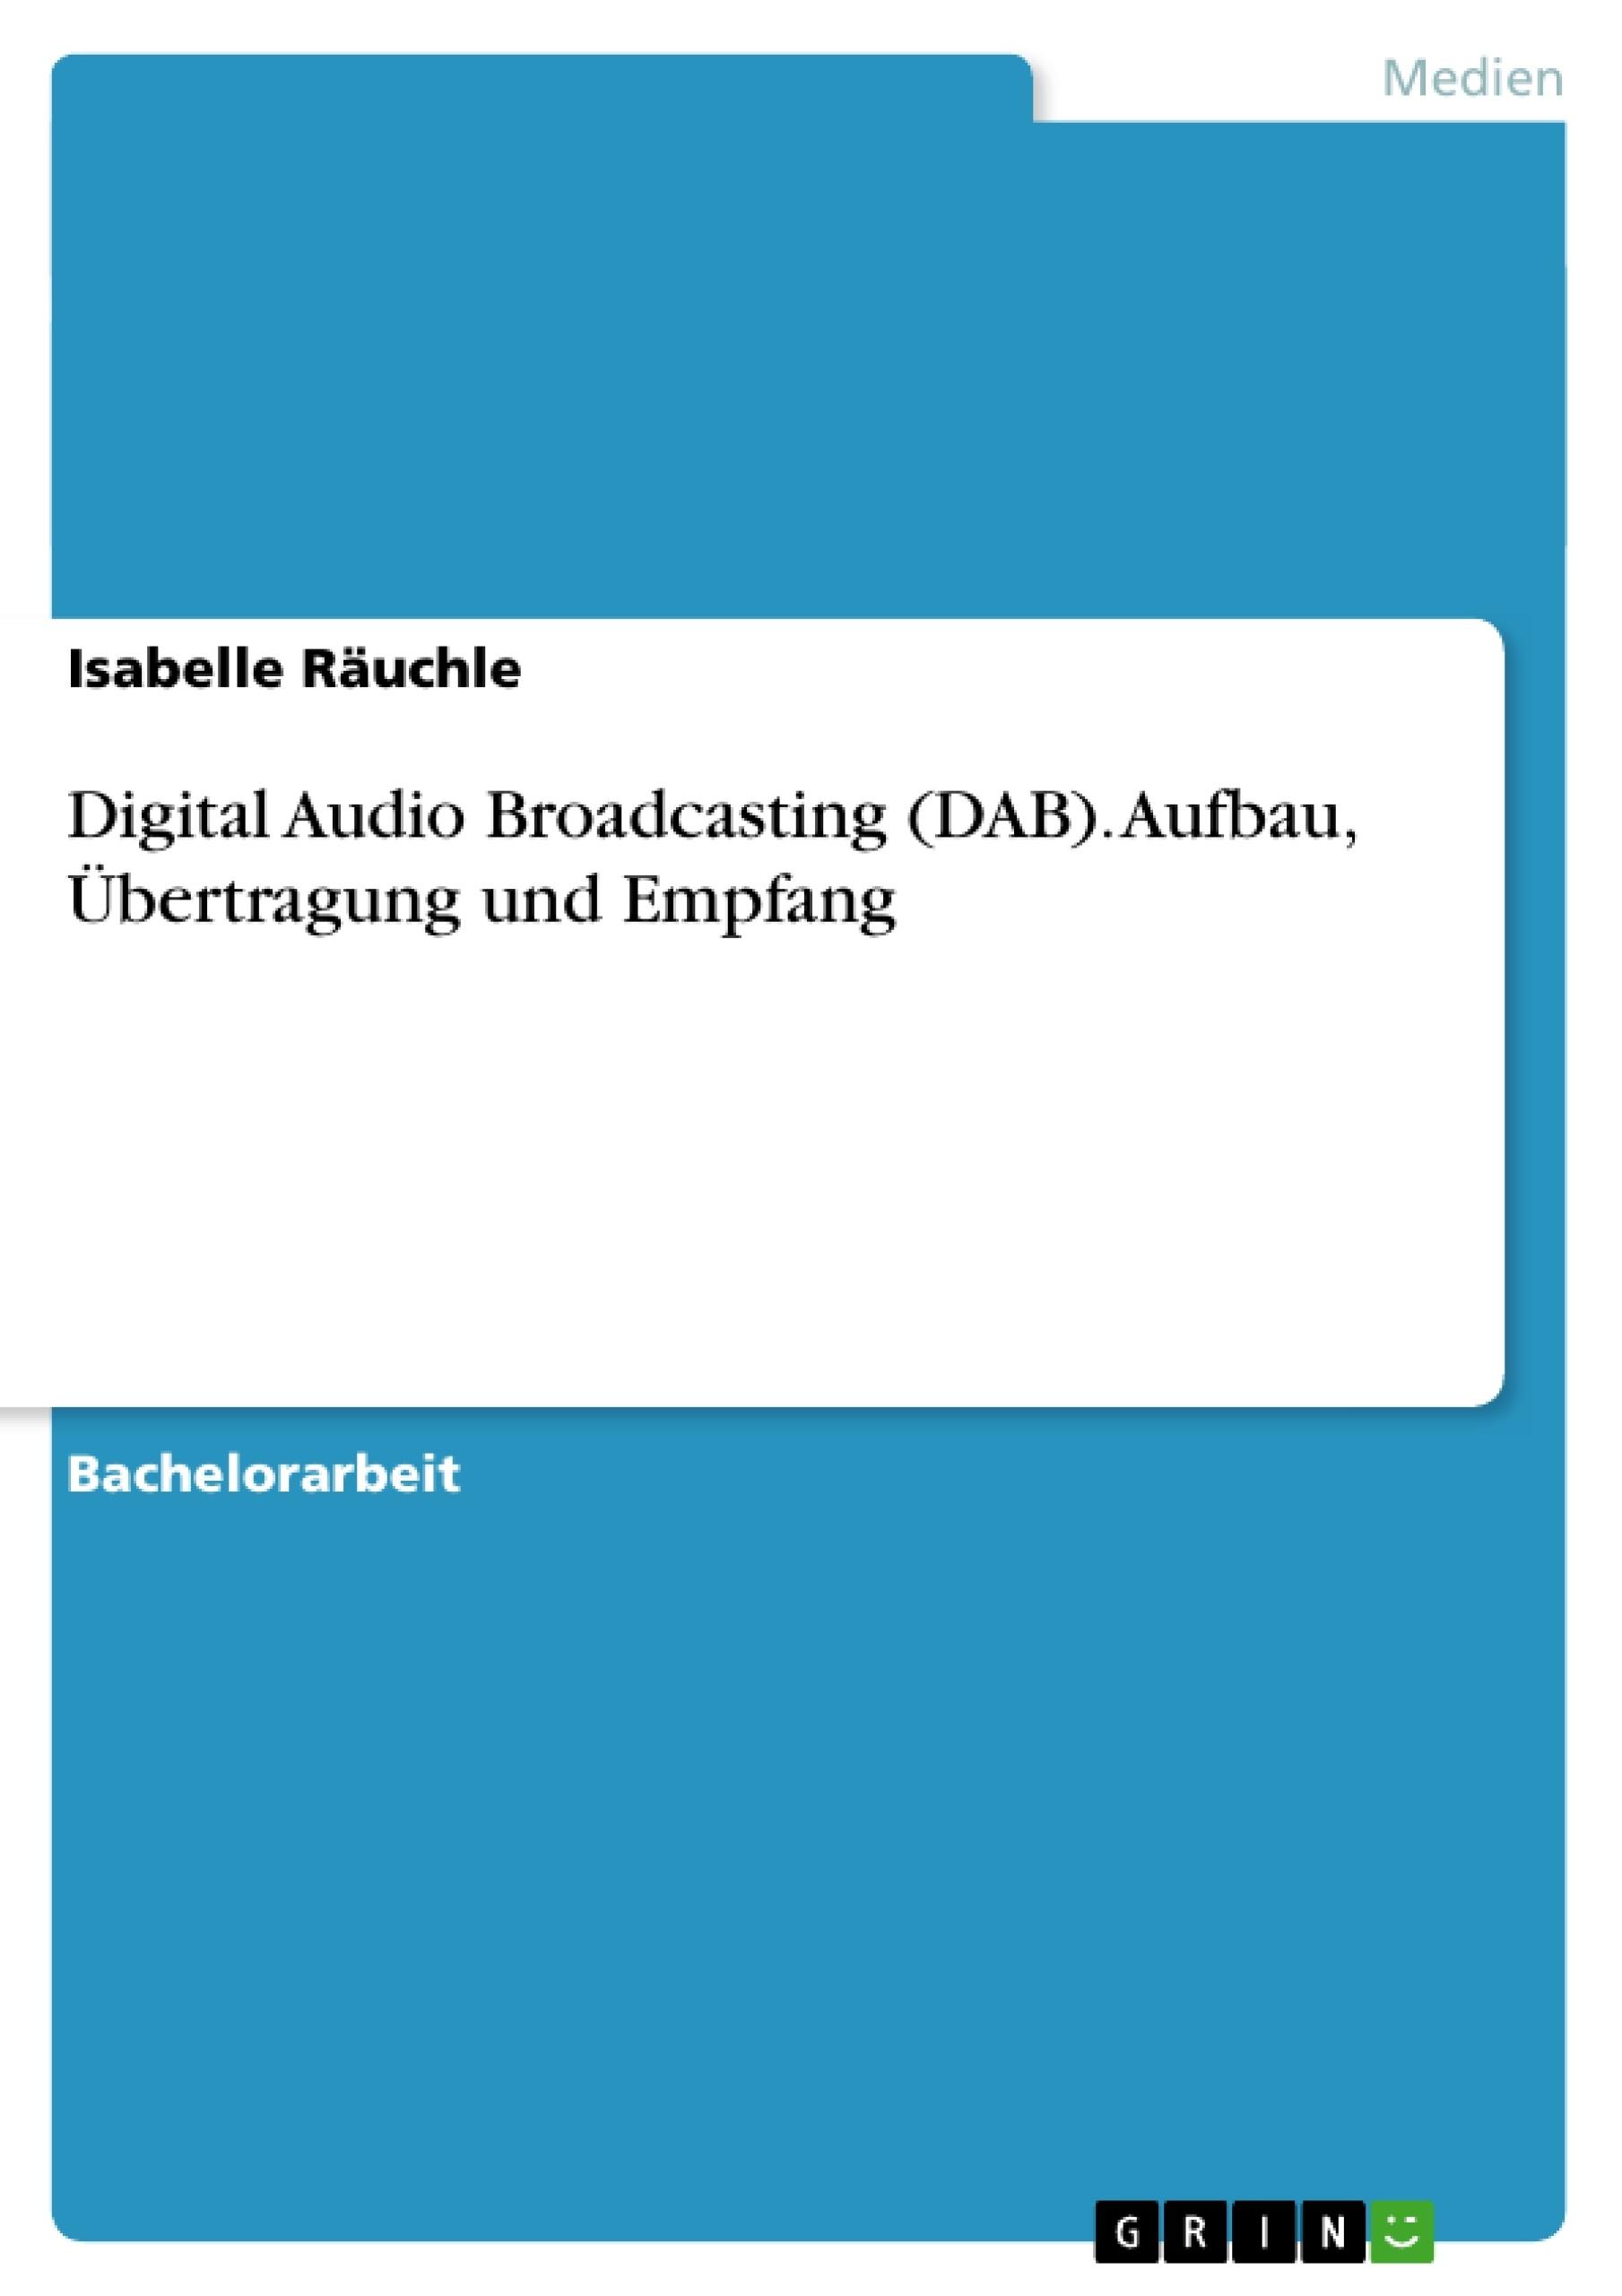 Digital Audio Broadcasting (DAB). Aufbau, Übertragung und Empfang ...